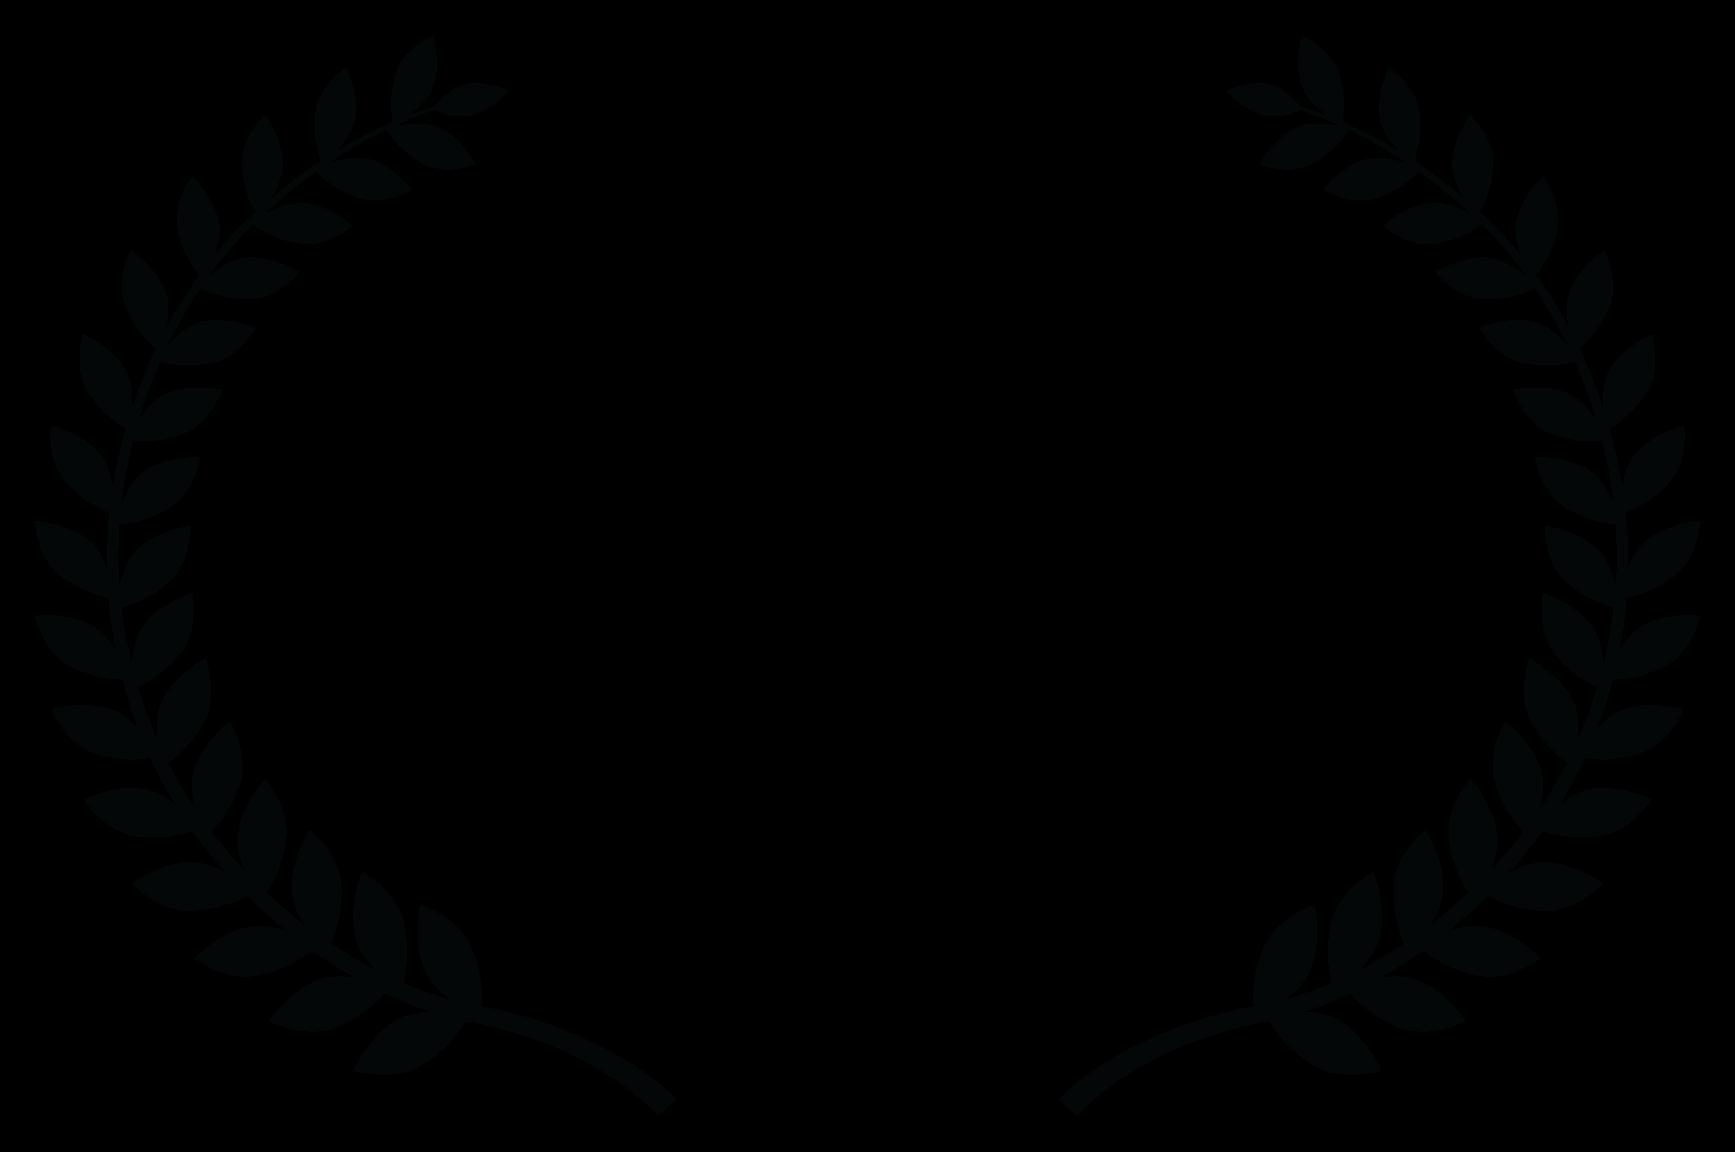 OFFICIAL SELECTION - World Cine Fest - 2021 (2)